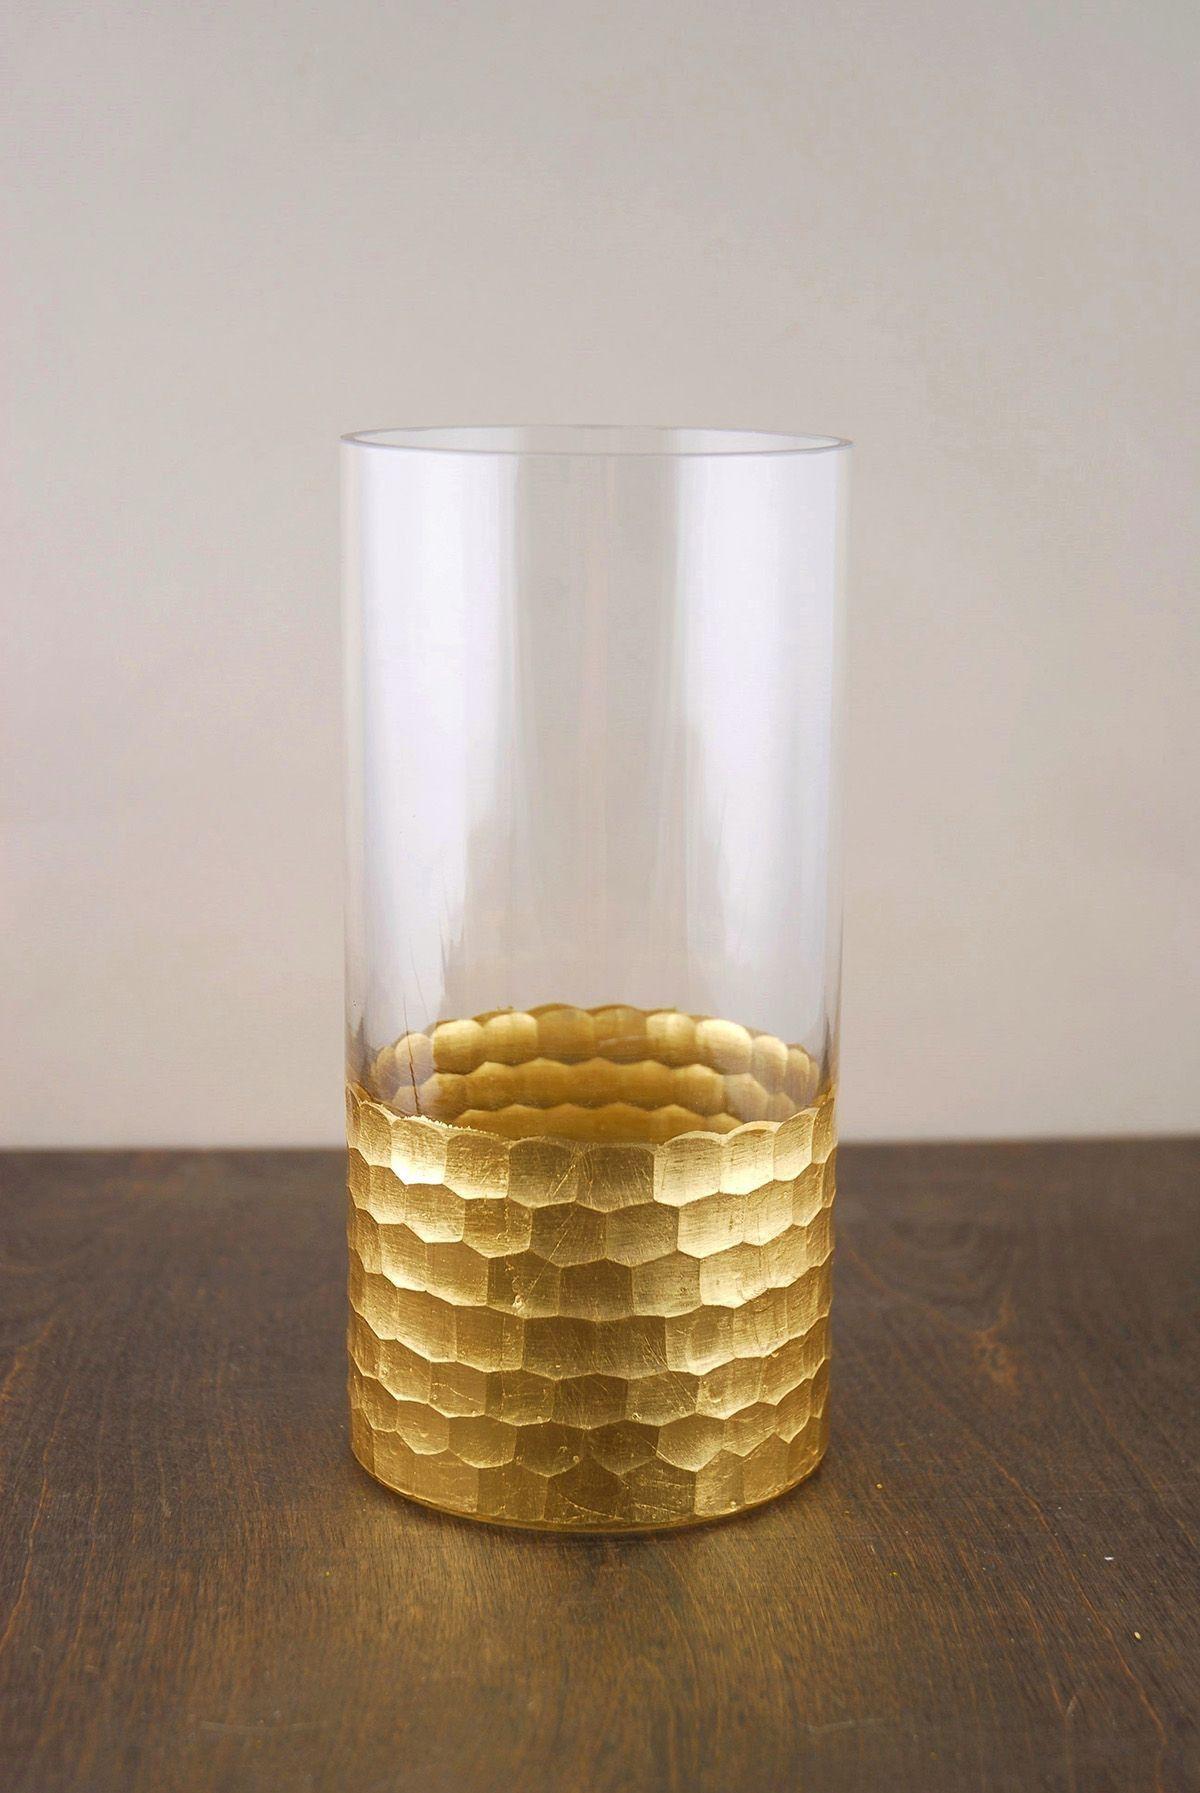 large footed crystal vase of gold mercury glass vases inspirational gold cylinder vases inside gold mercury glass vases inspirational gold cylinder vases collection silver and gold mercury glass mosaic